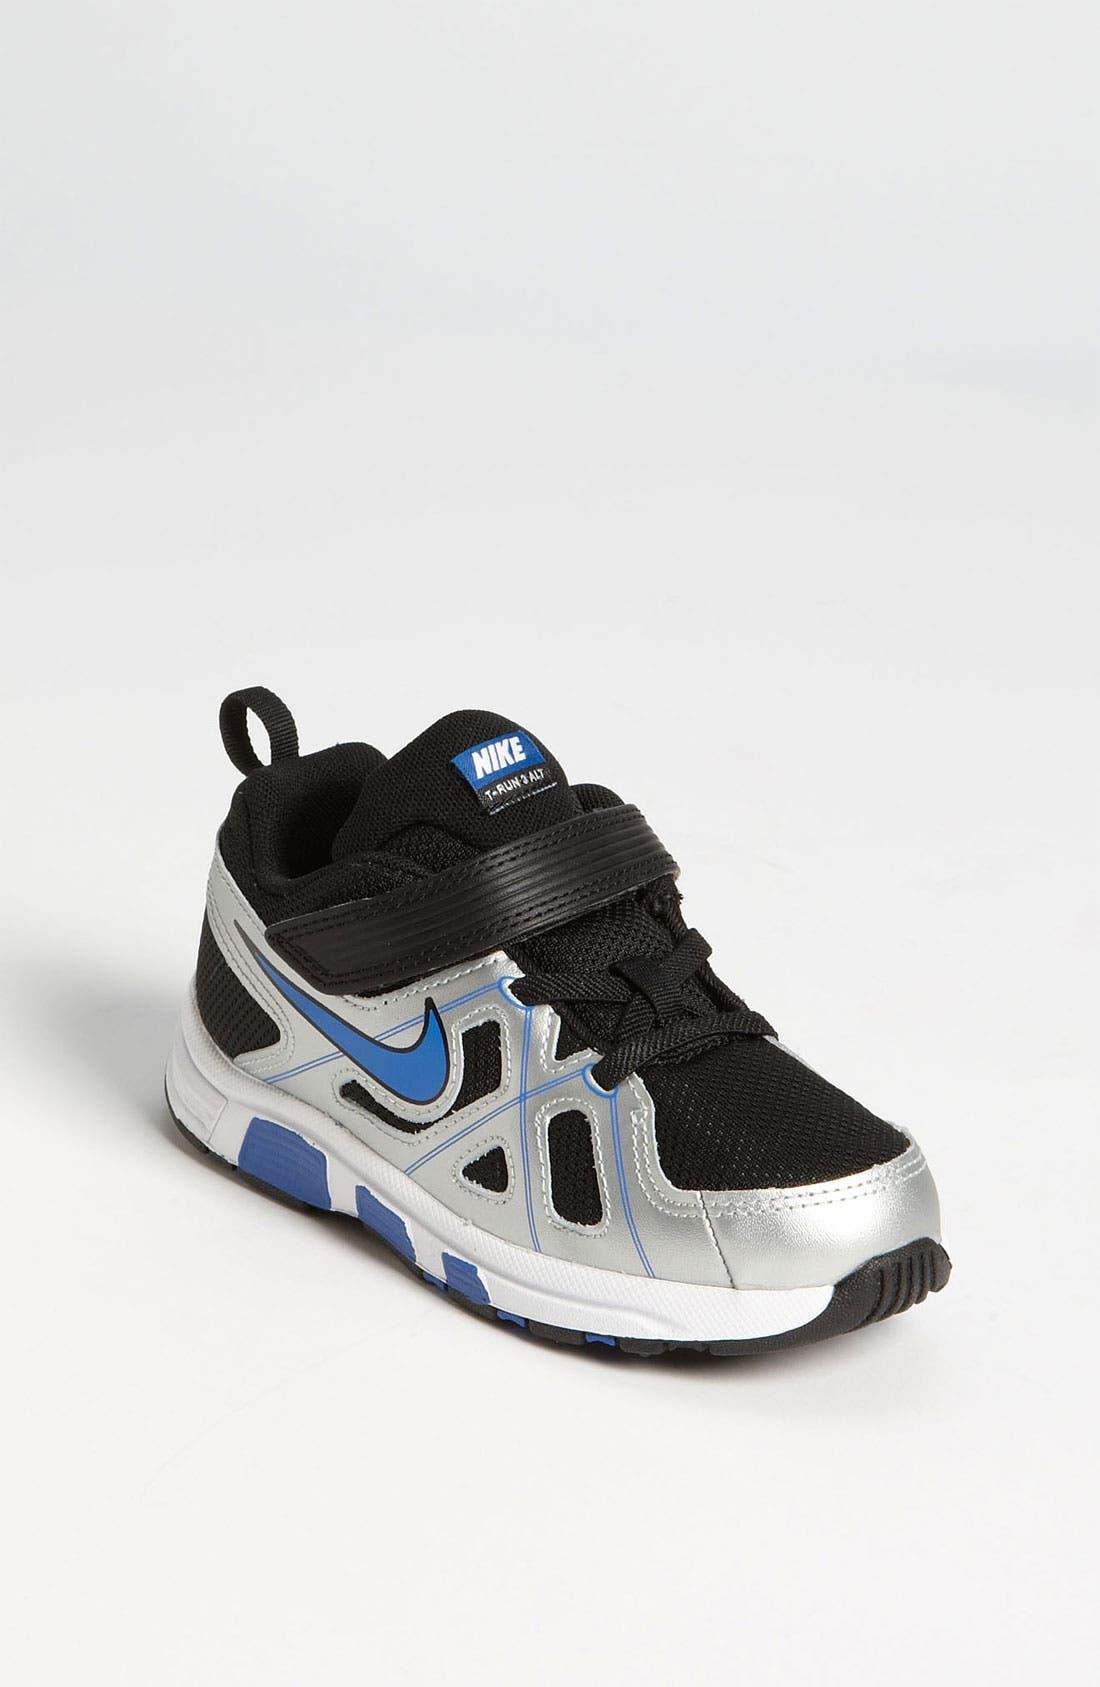 Alternate Image 1 Selected - Nike 'T-Run 3 Alt' Running Shoe (Baby, Walker & Toddler) (Special Purchase)